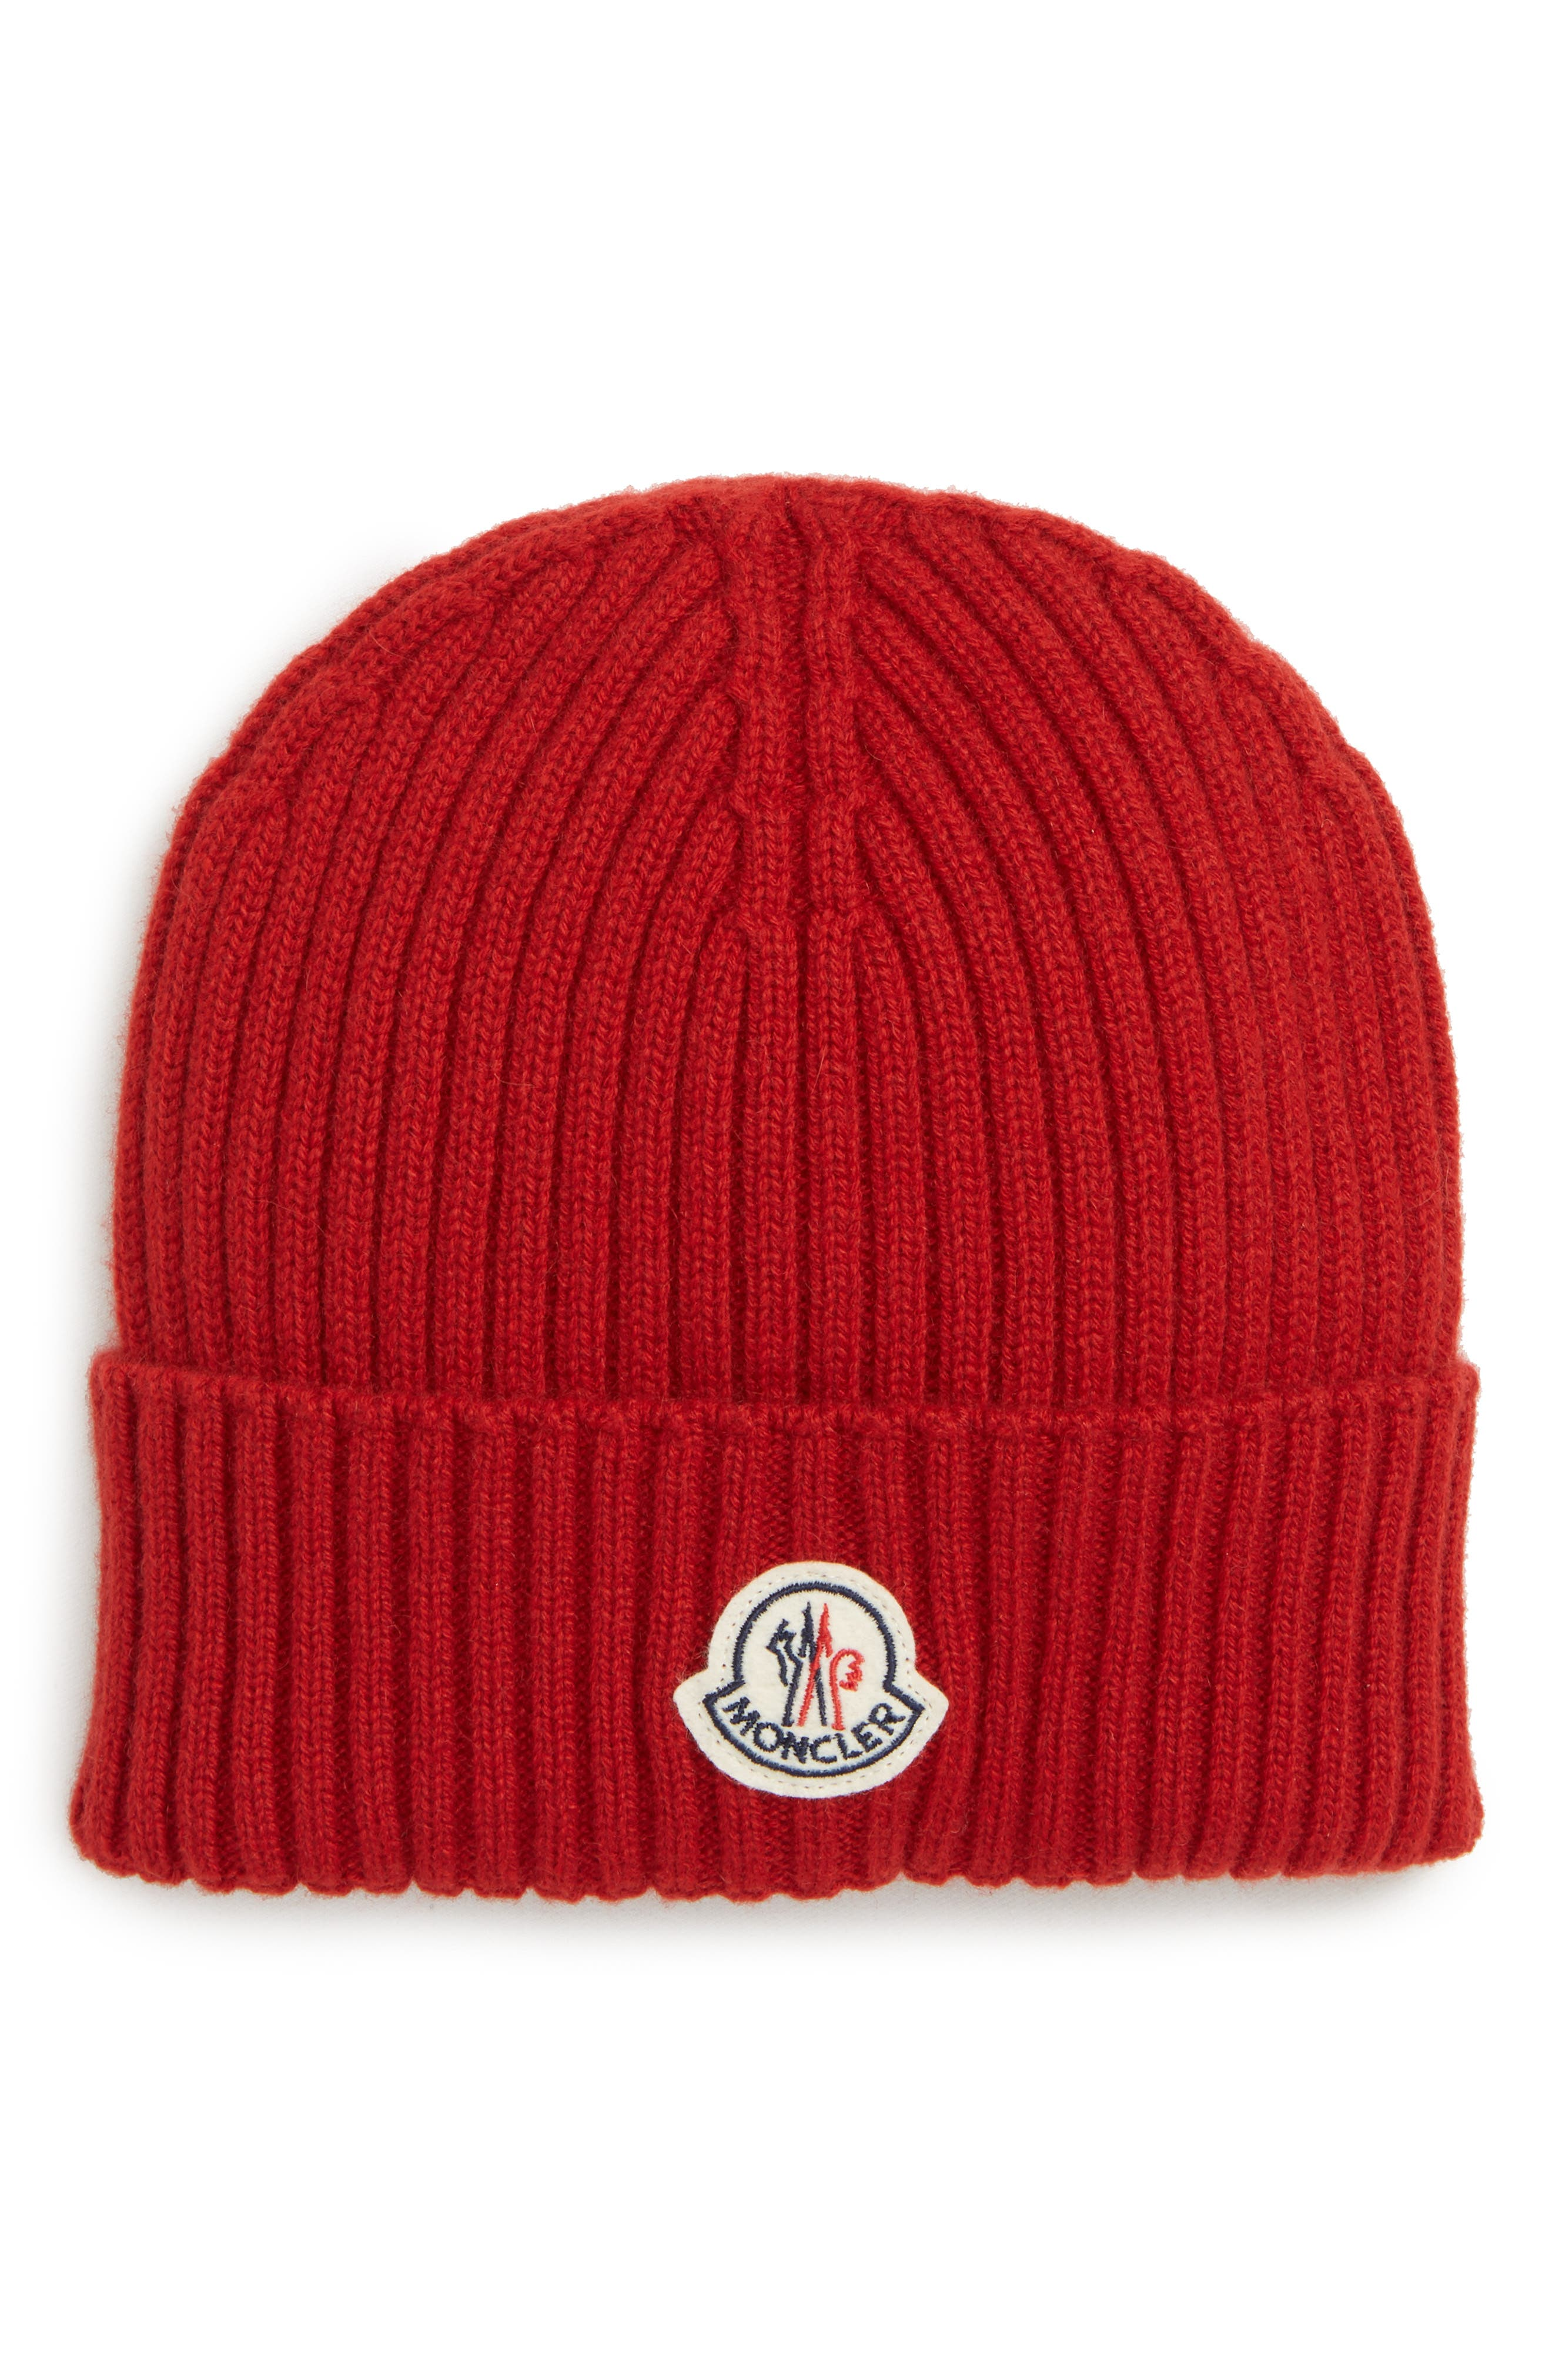 55b897e8 Men's Beanies: Knit Caps & Winter Hats | Nordstrom